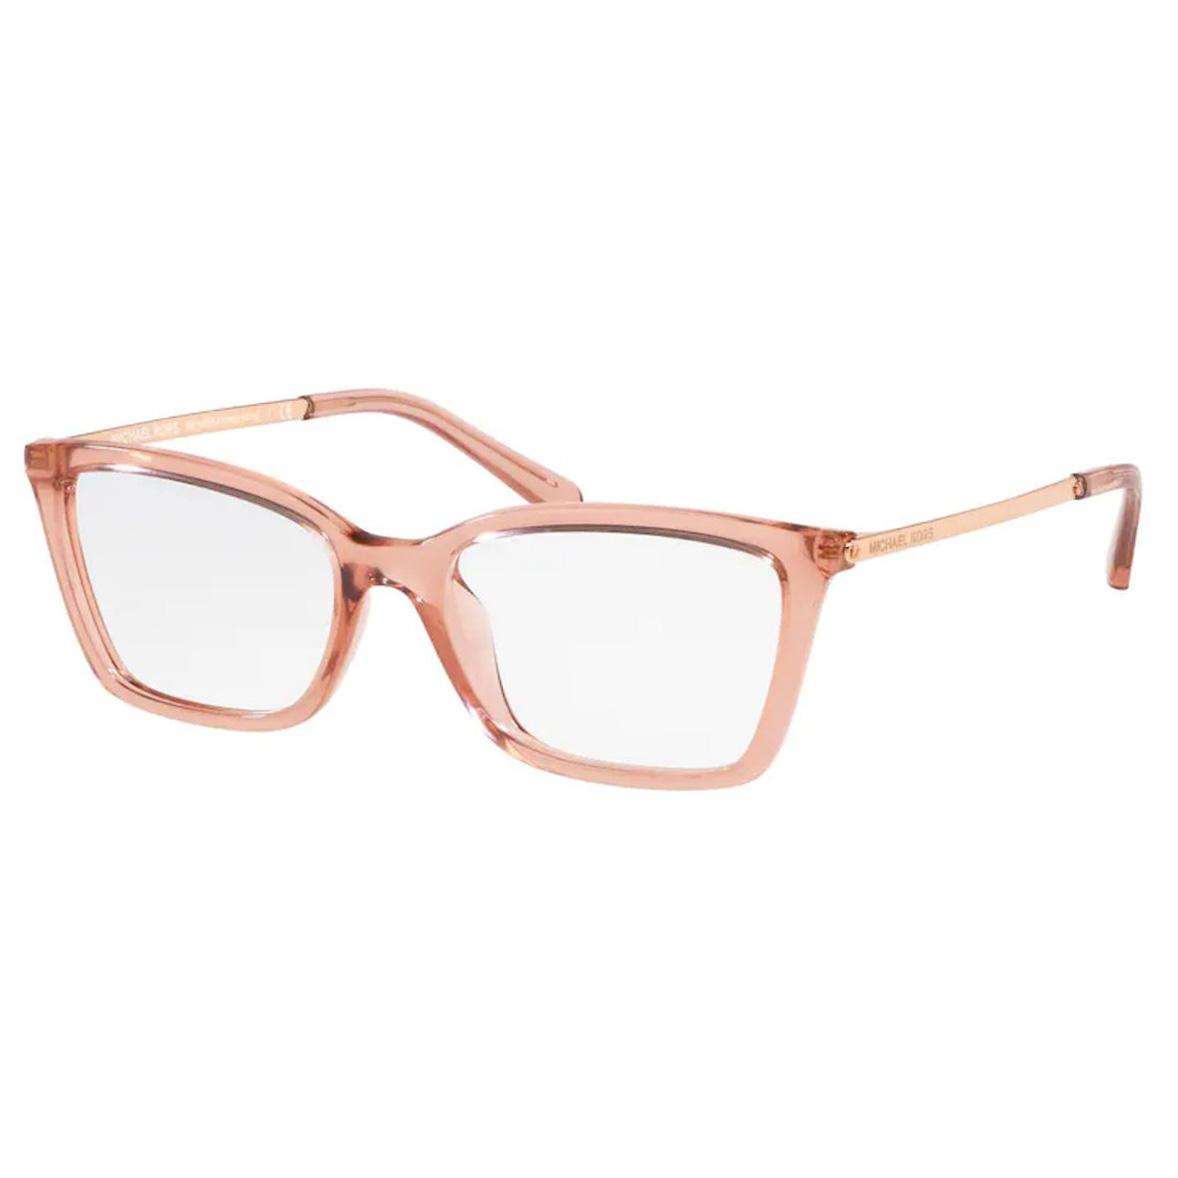 Óculos de Grau Michael Kors Hong Kong MK4069U Rosa Translúcido